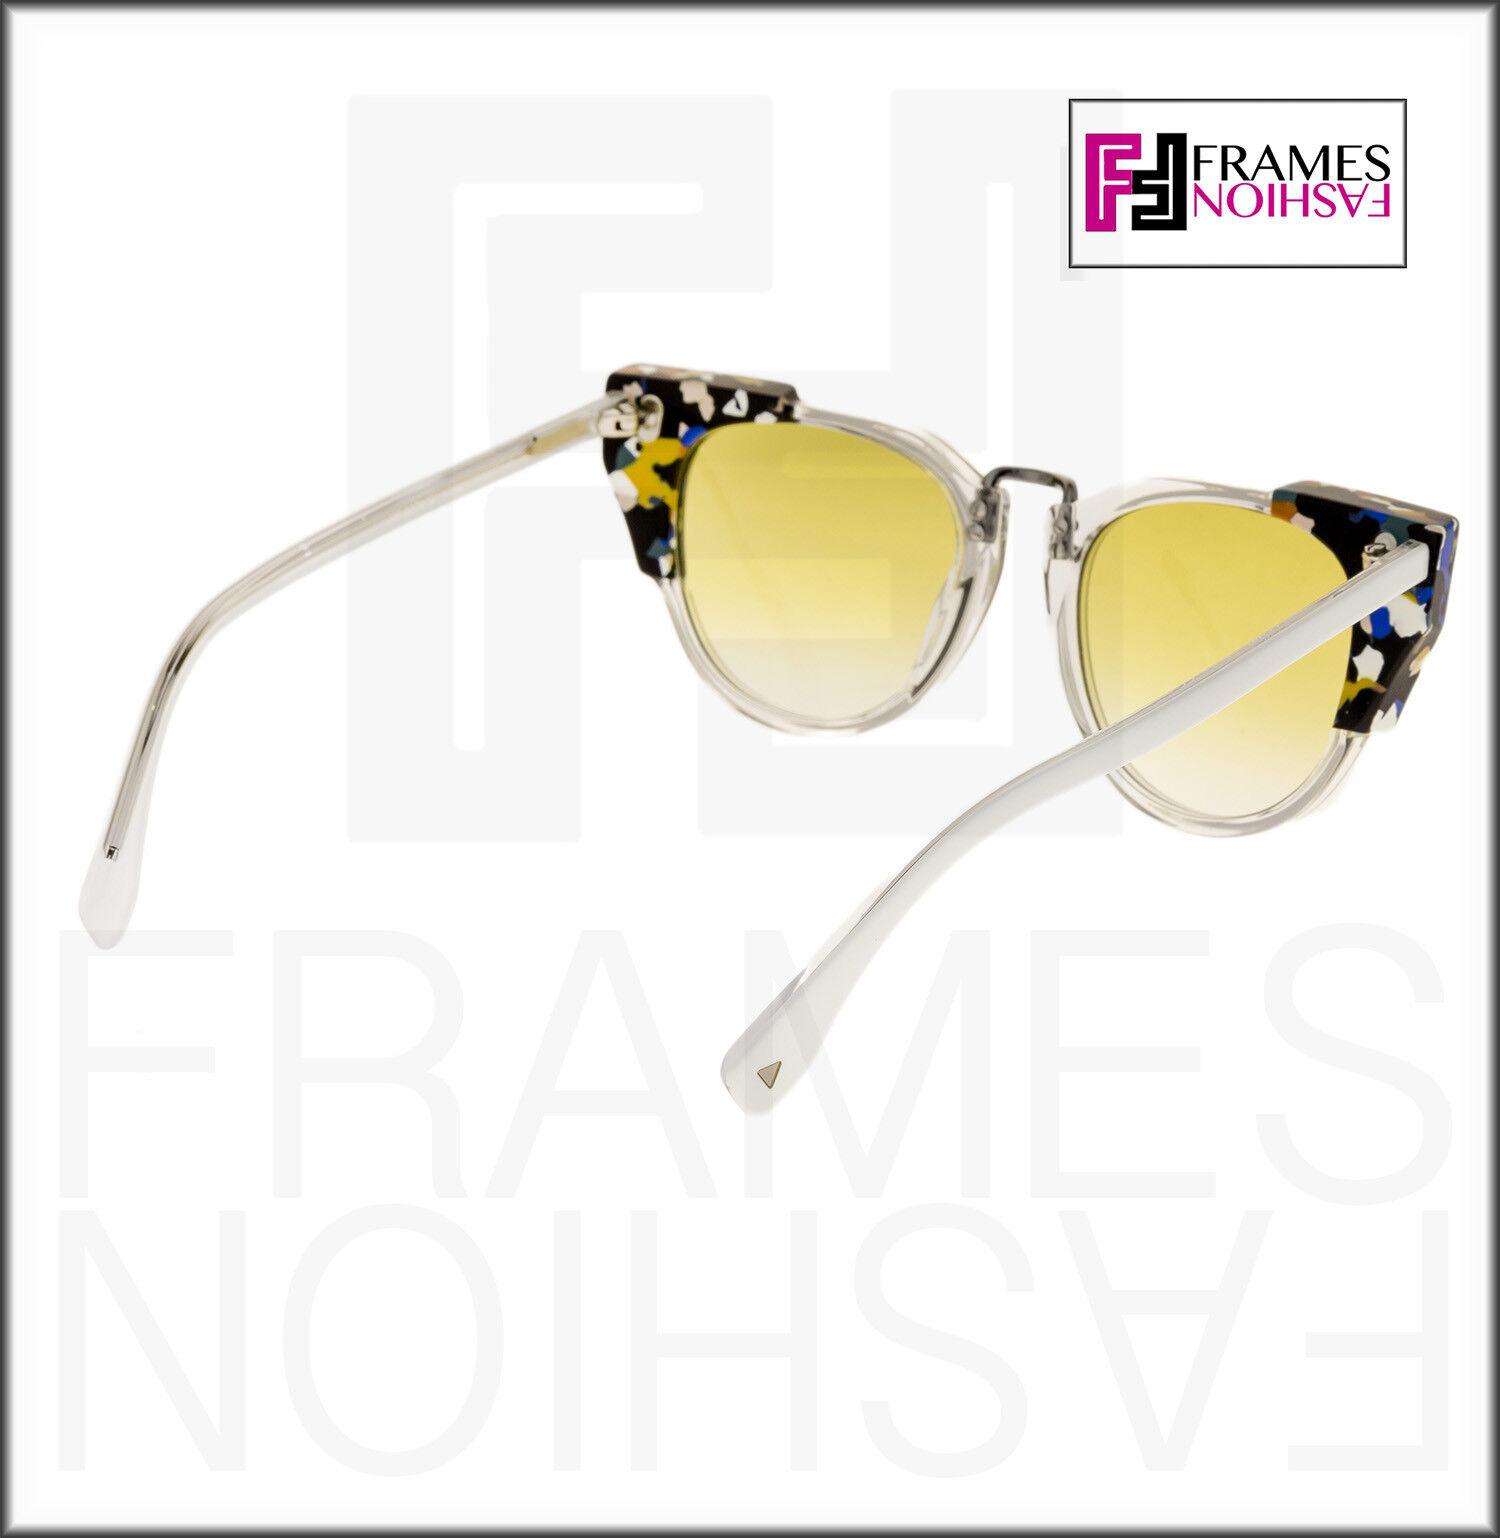 11f19cd220ff Fendi FF 0074 s Sunglasses RCKSV Transparent Crystal White Marbled ...